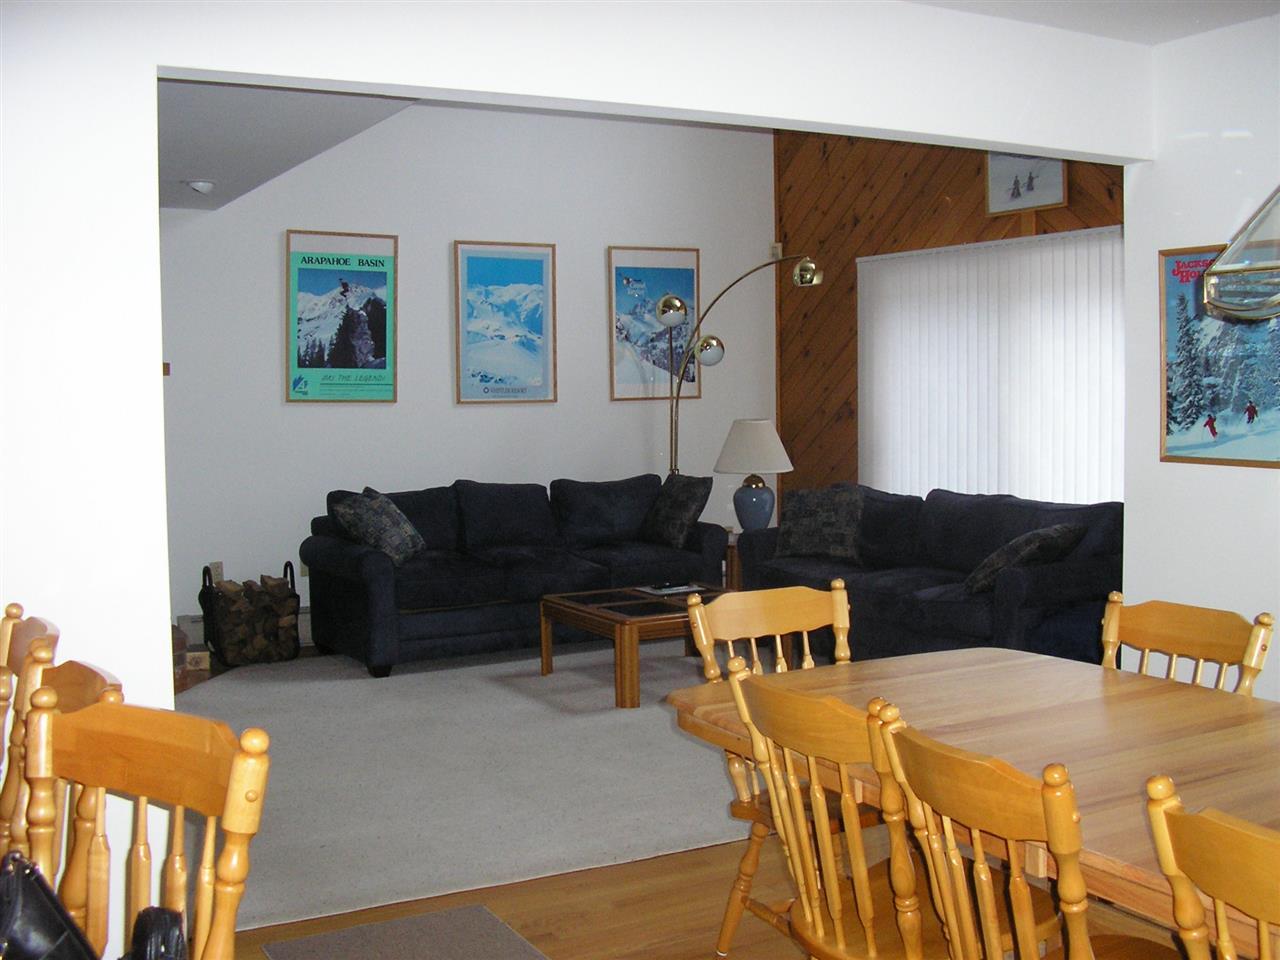 Mount-Snow-Real-Estate-4623897-4